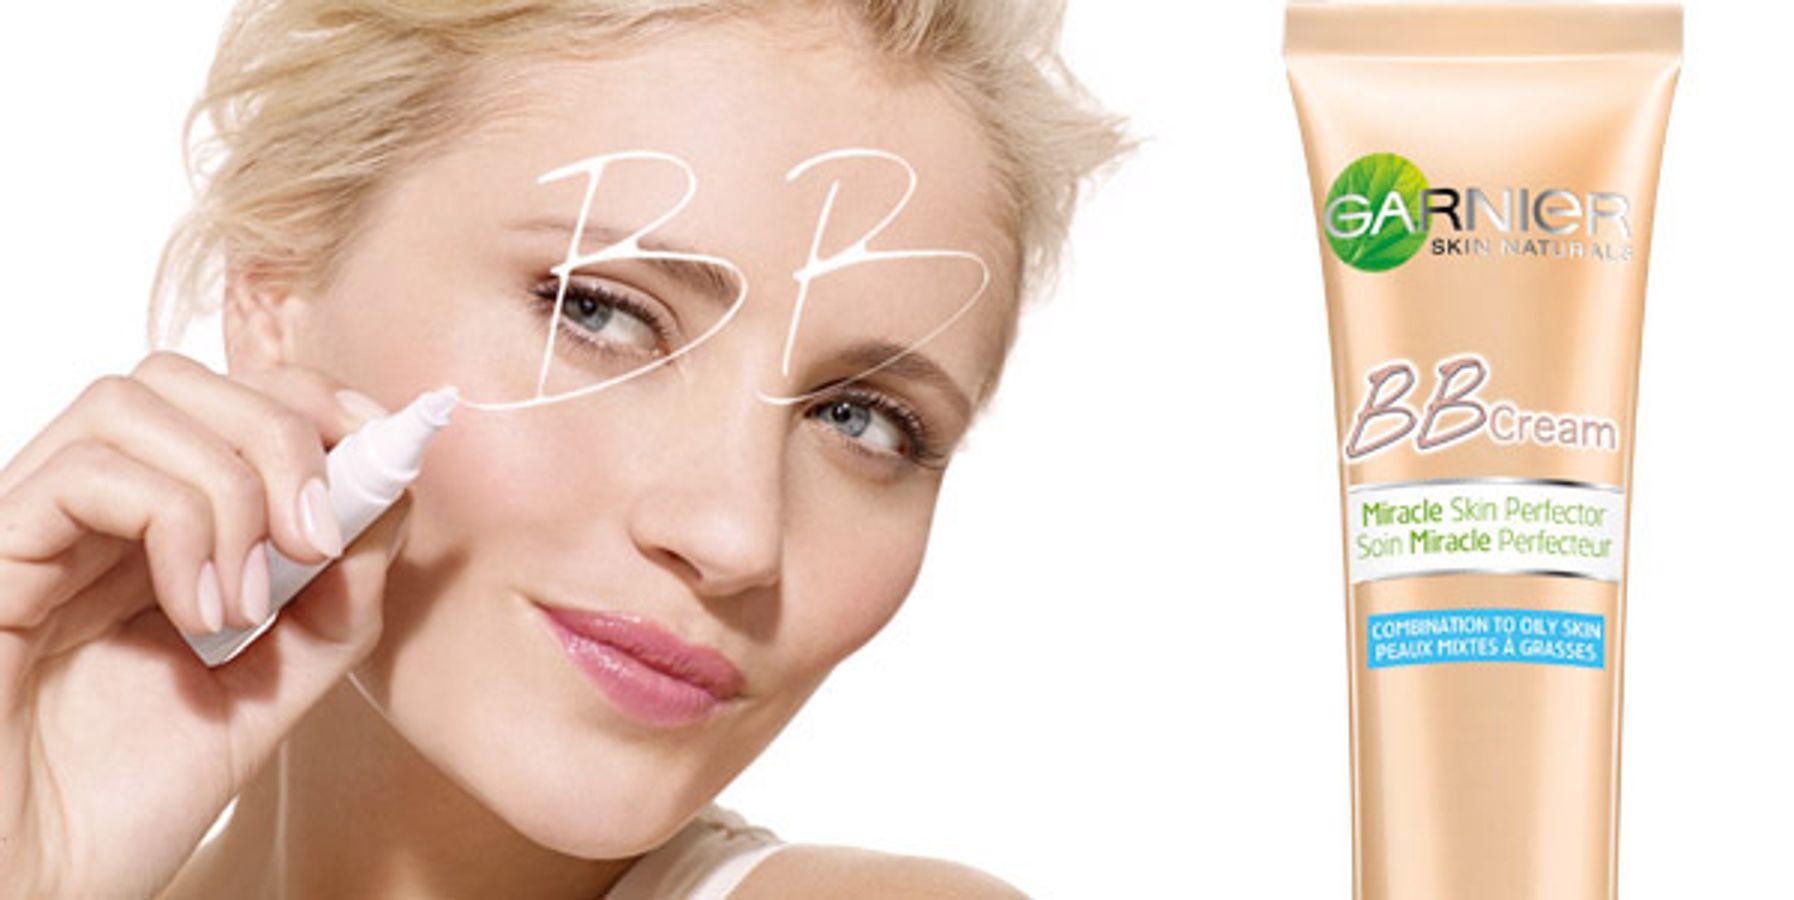 Bb Cream Garnier Miracle Skin Perfector 40ml